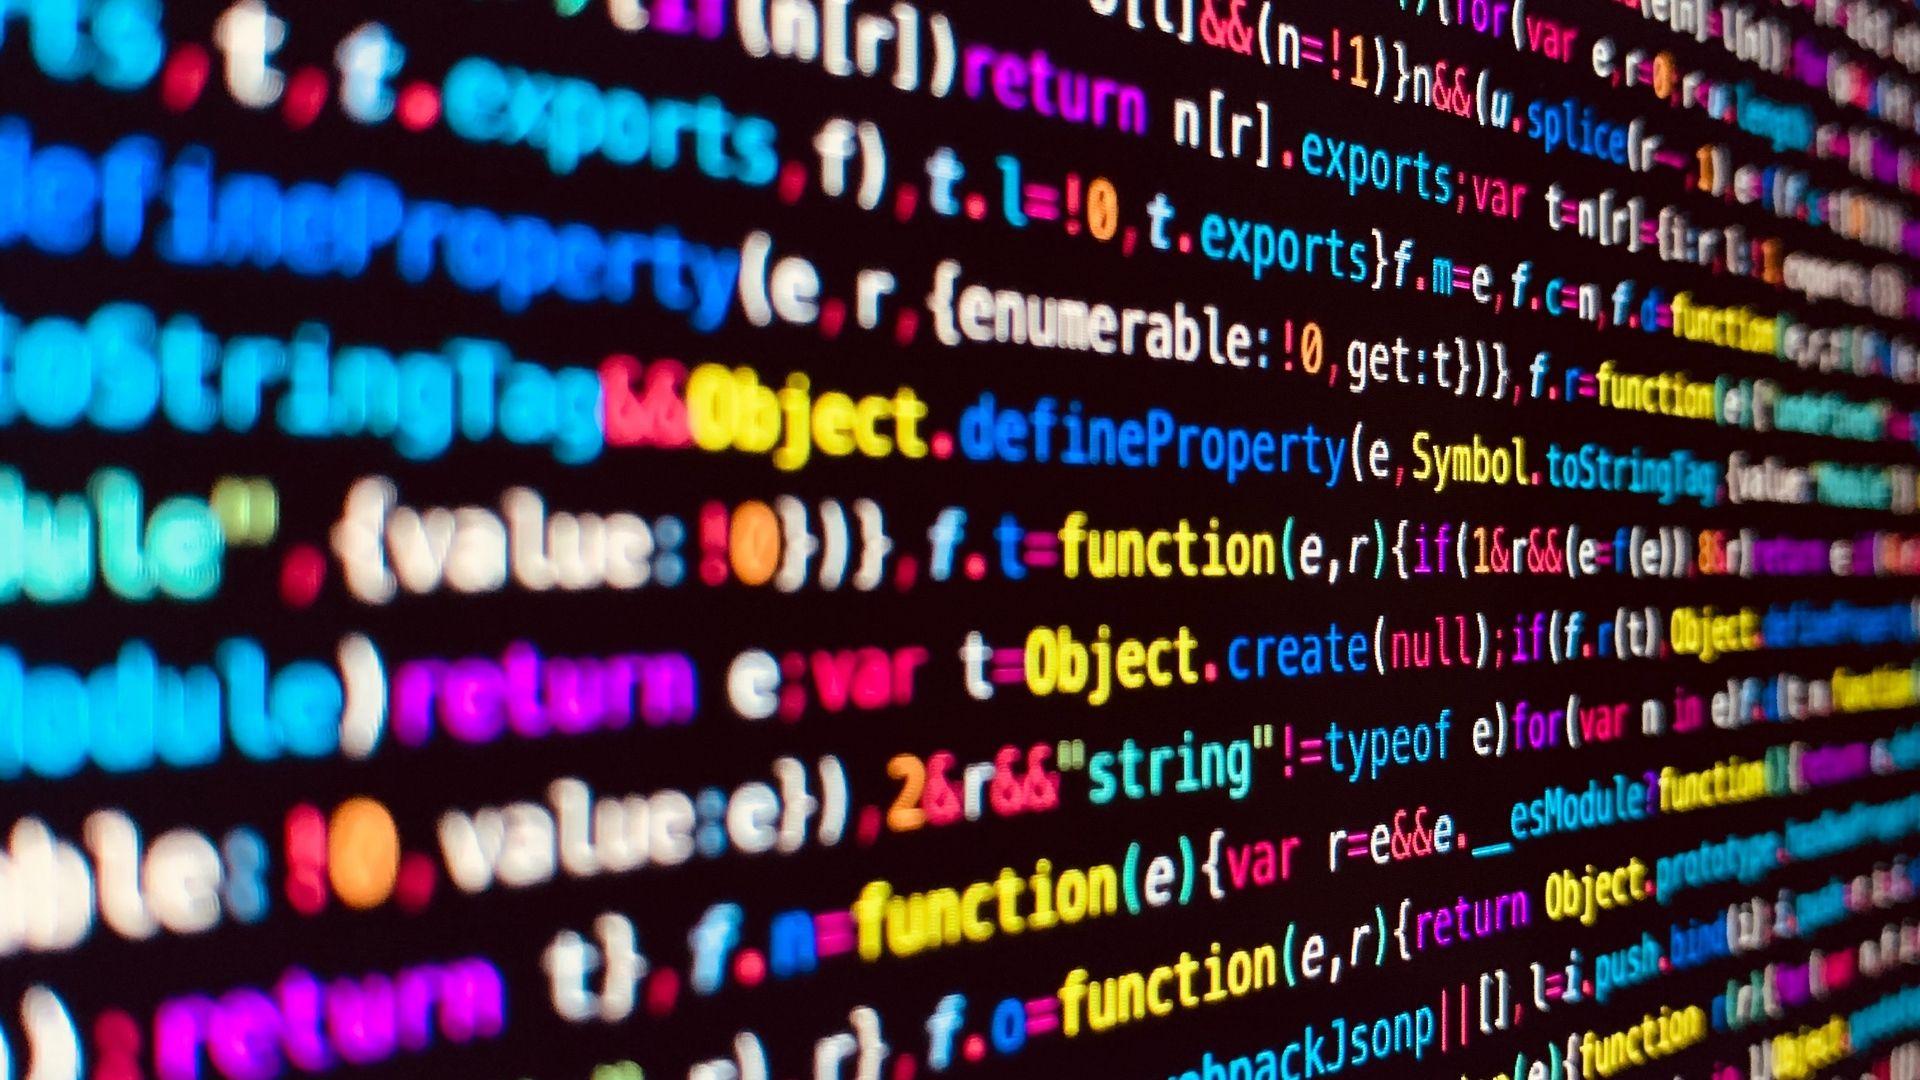 Coding wallpaper hd